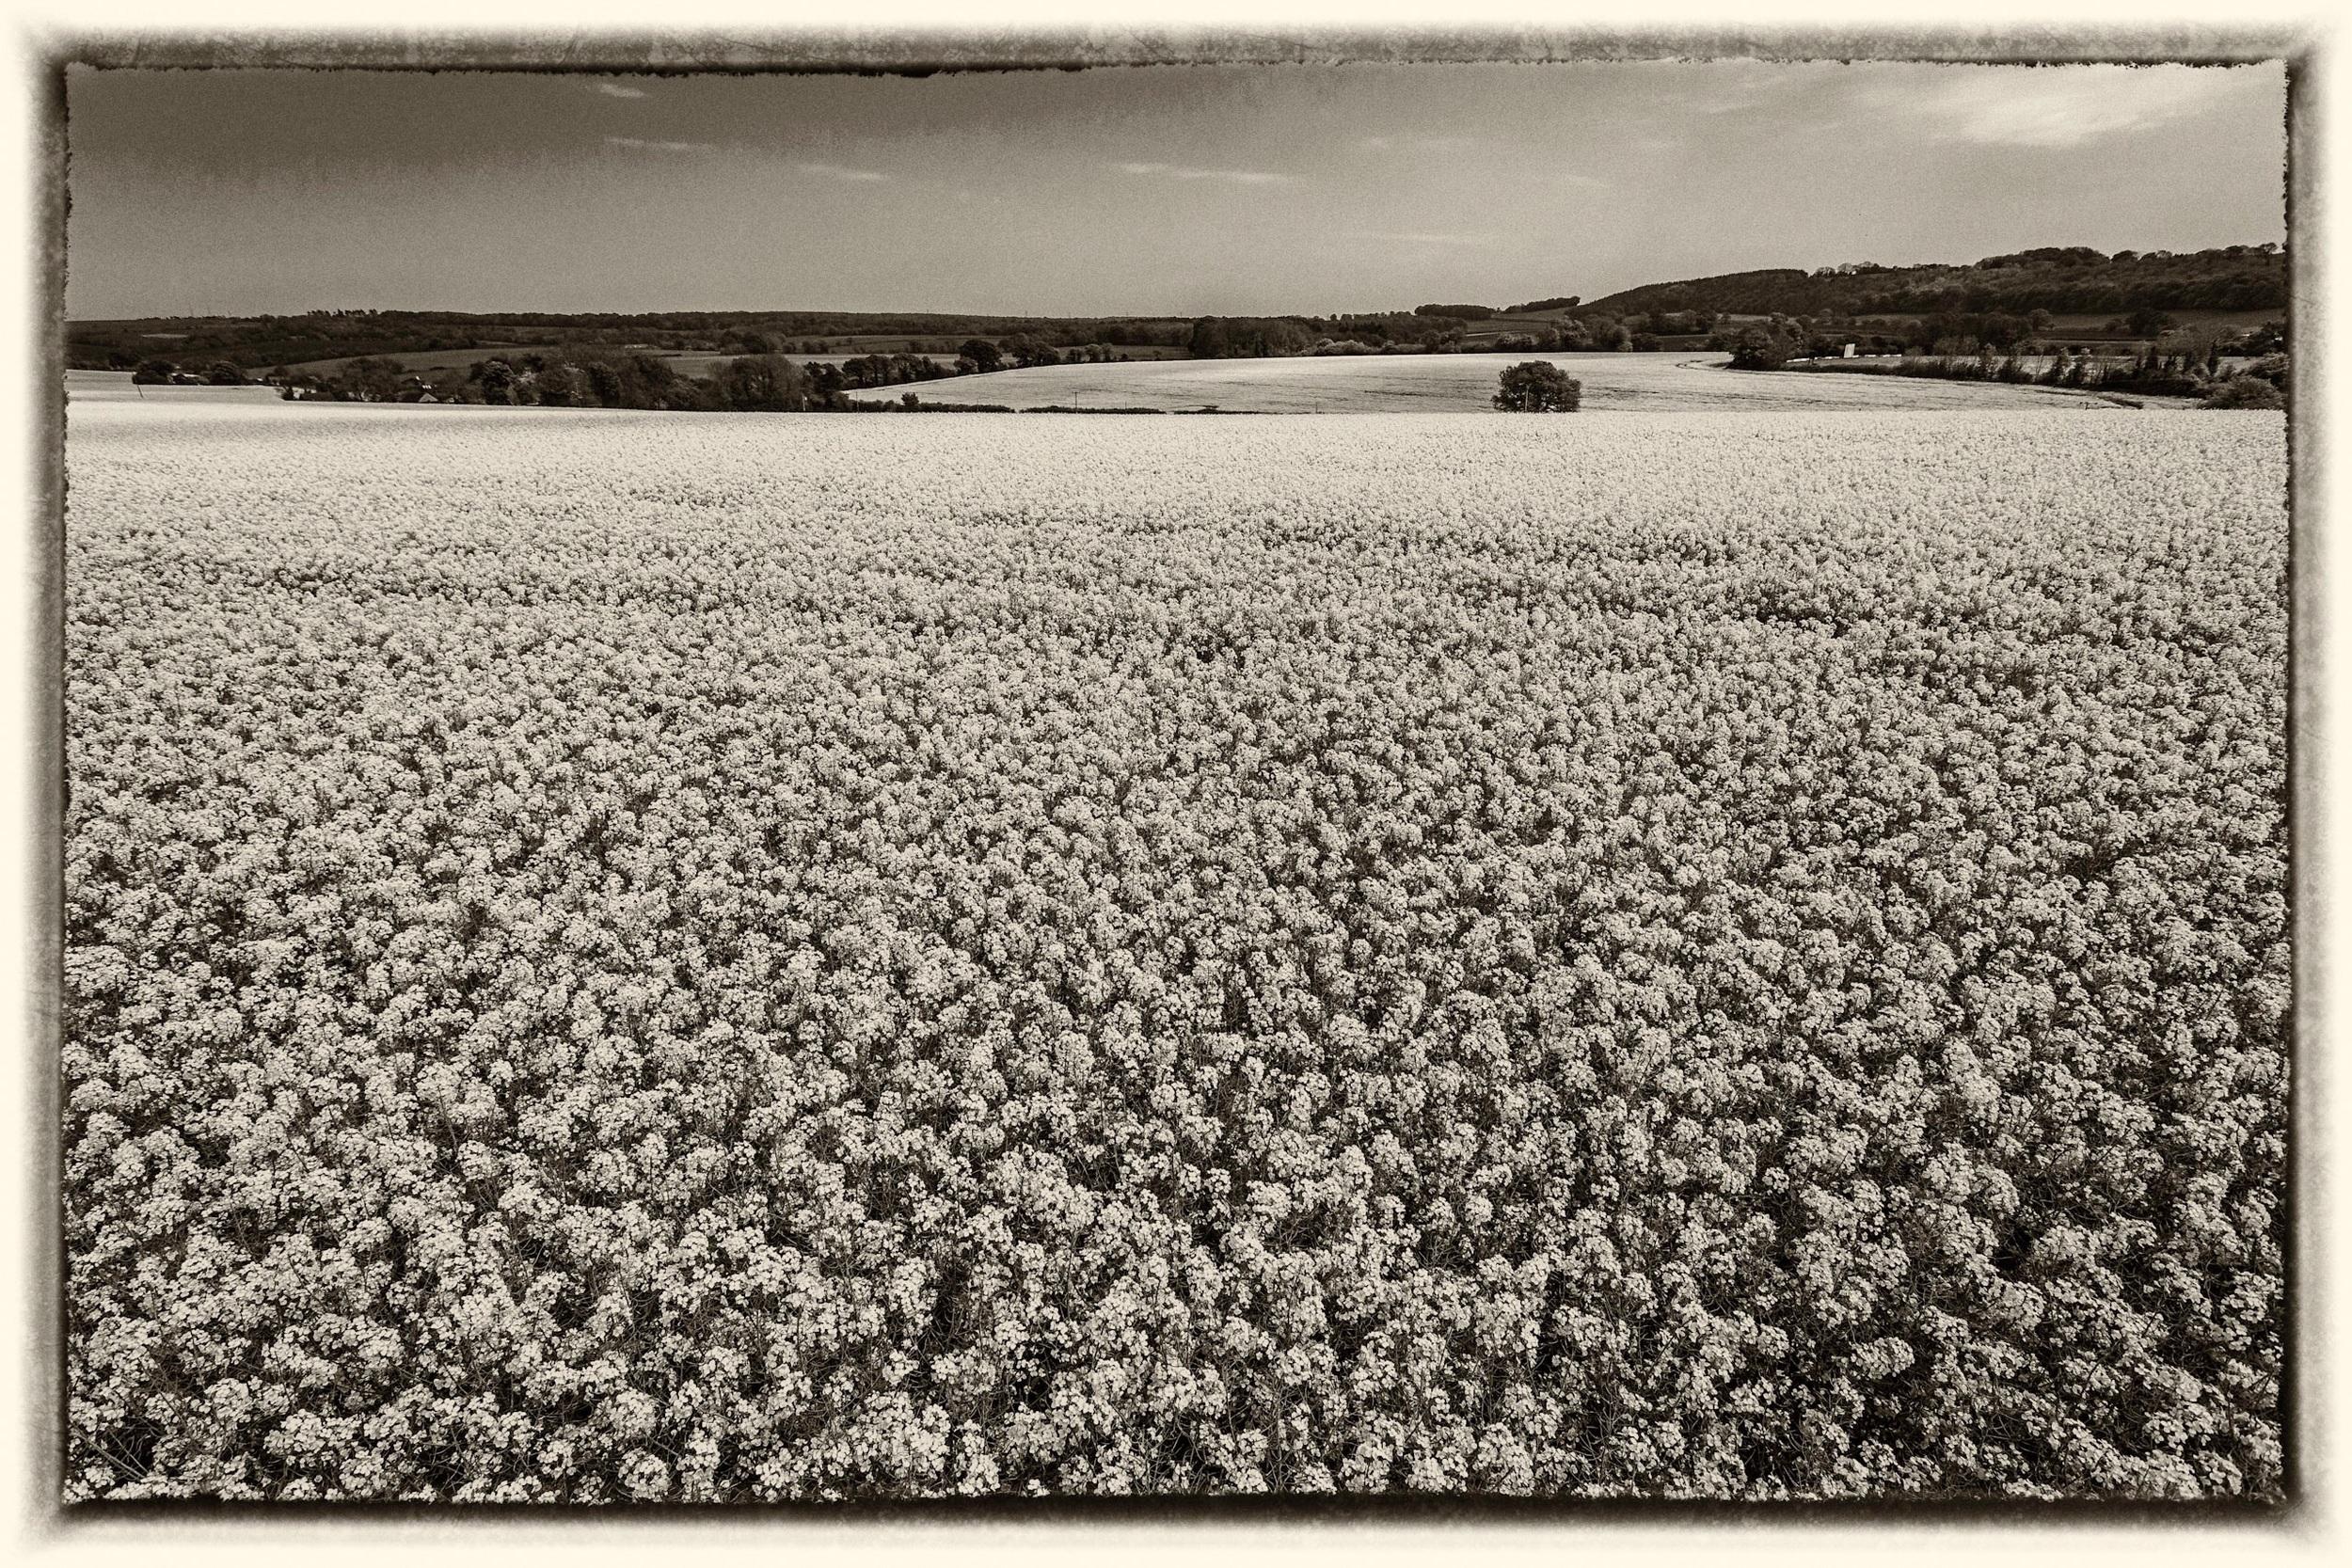 Black and white landscape photography processed using Nik Sikver Efex Pro